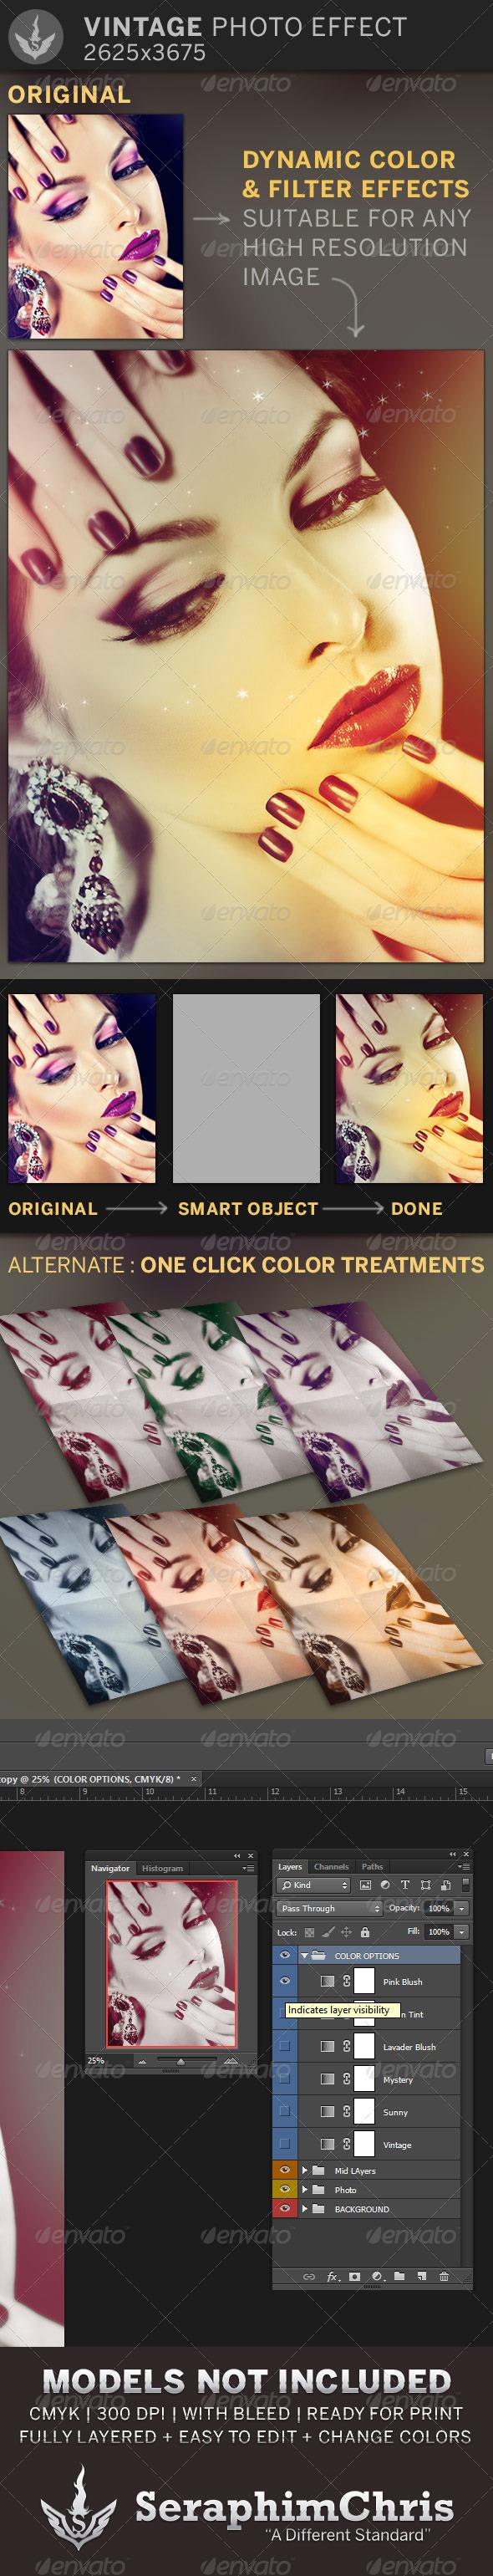 Vintage Photo Effect Template - Photo Templates Graphics